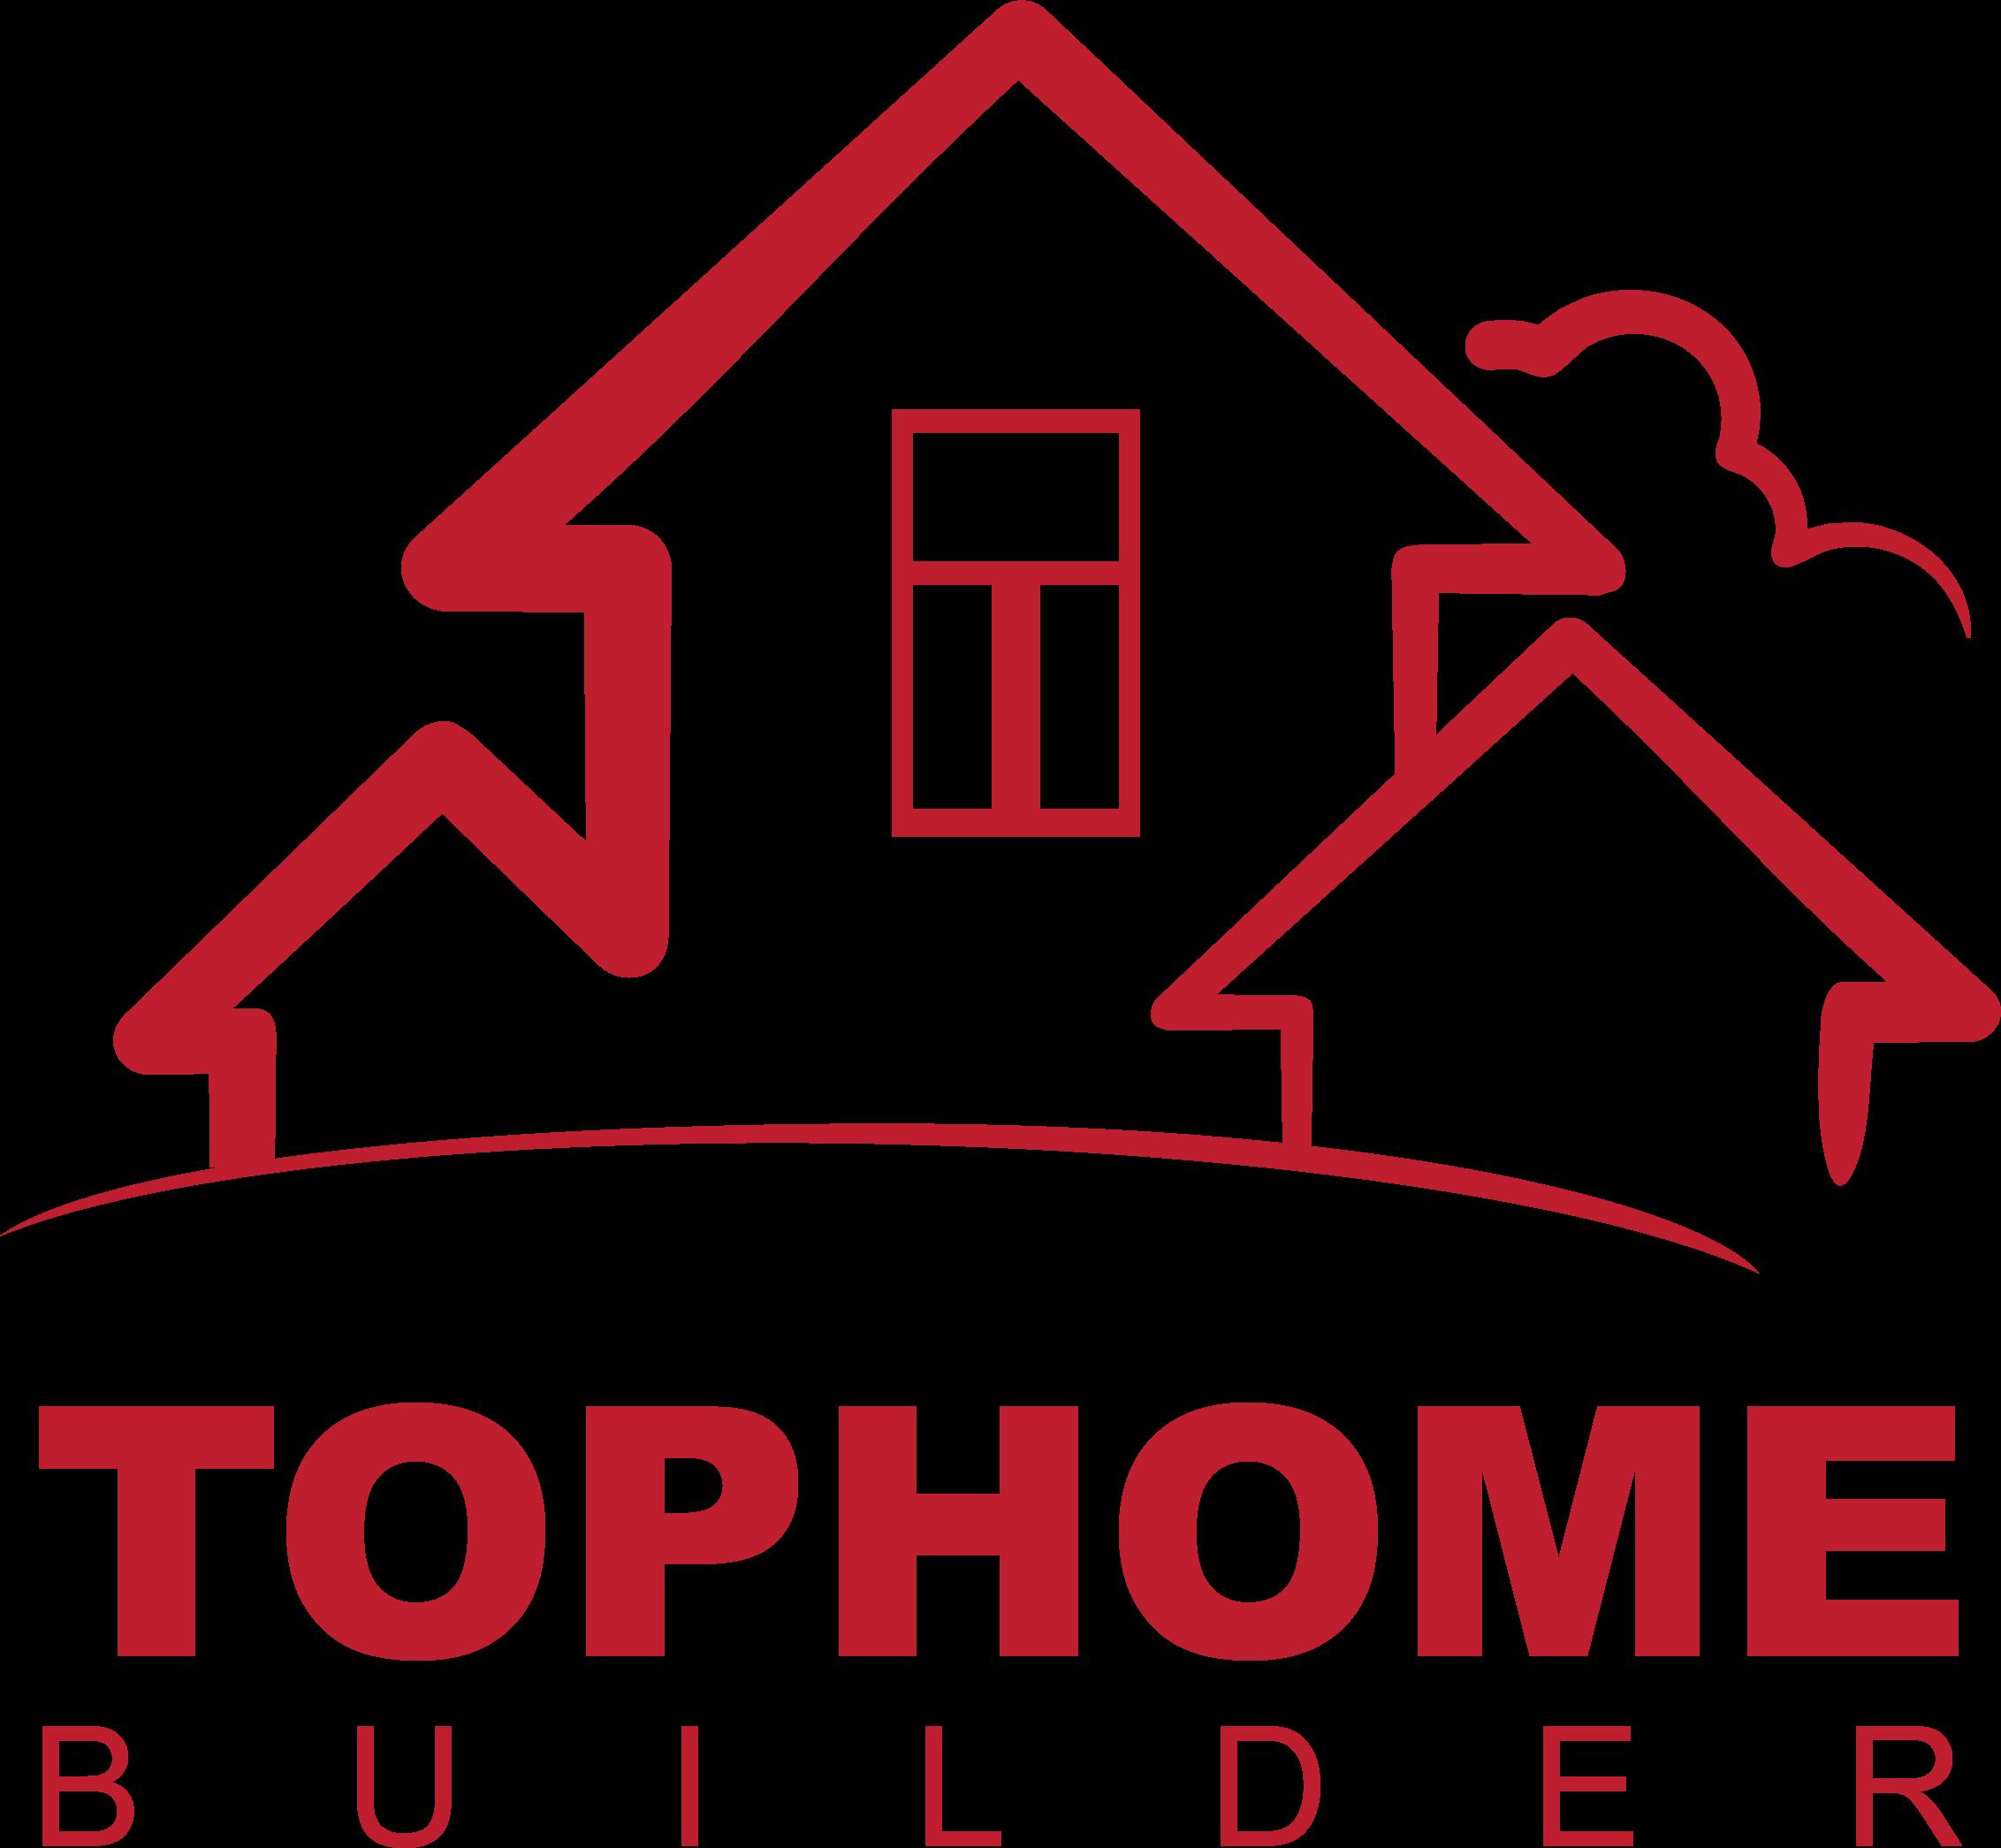 top home : Brand Short Description Type Here.